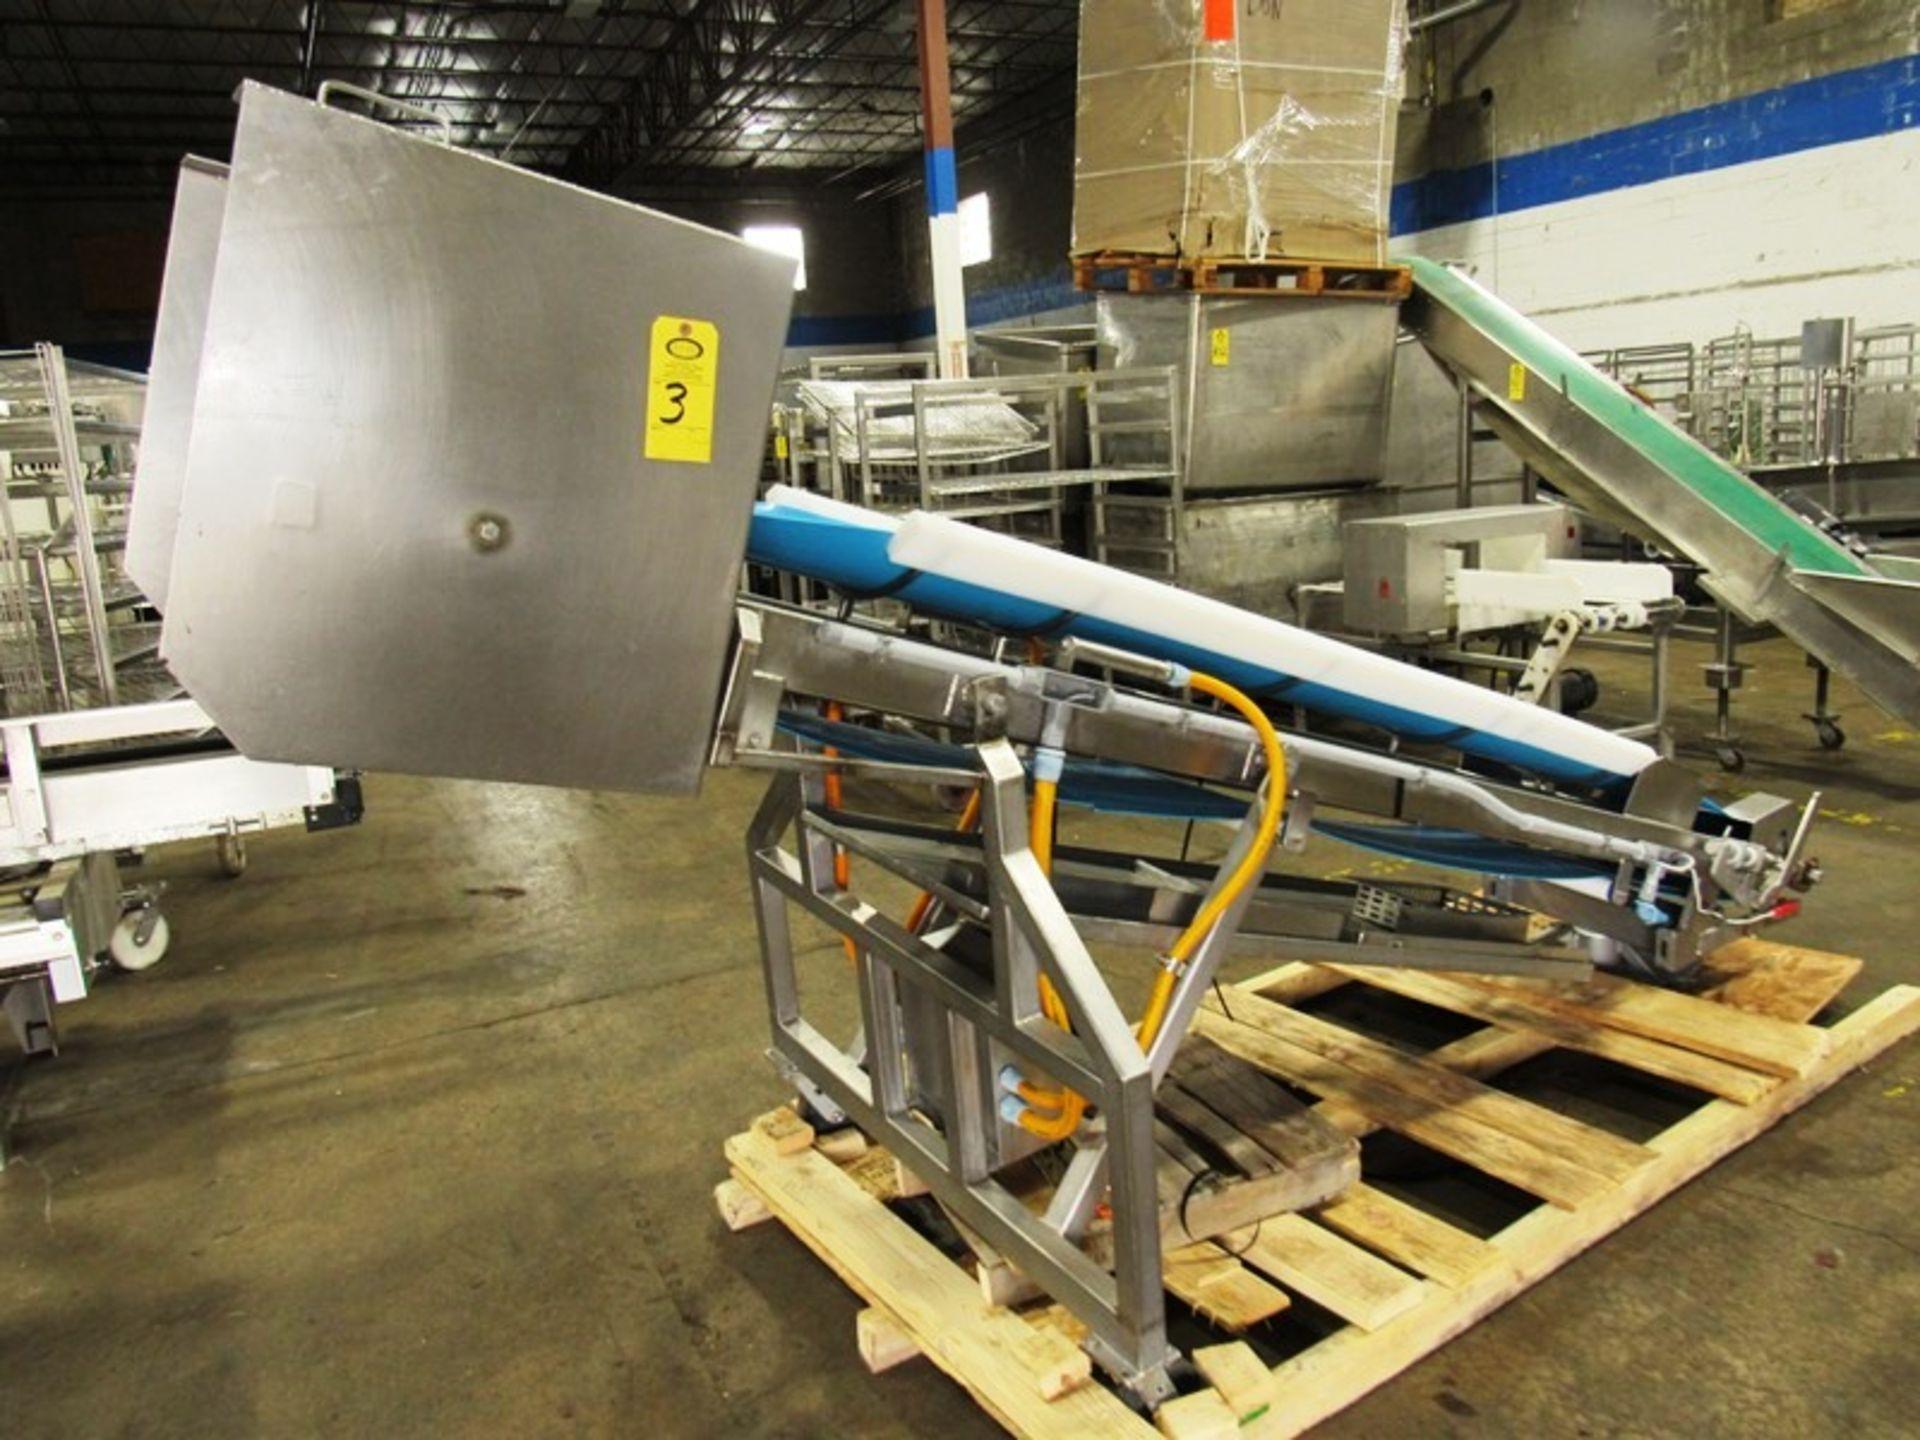 "Stainless Steel Incline Conveyor, 18"" Wide X 11' Long neoprene beltk 12"" inveed, 5' discharge, drum - Image 2 of 5"